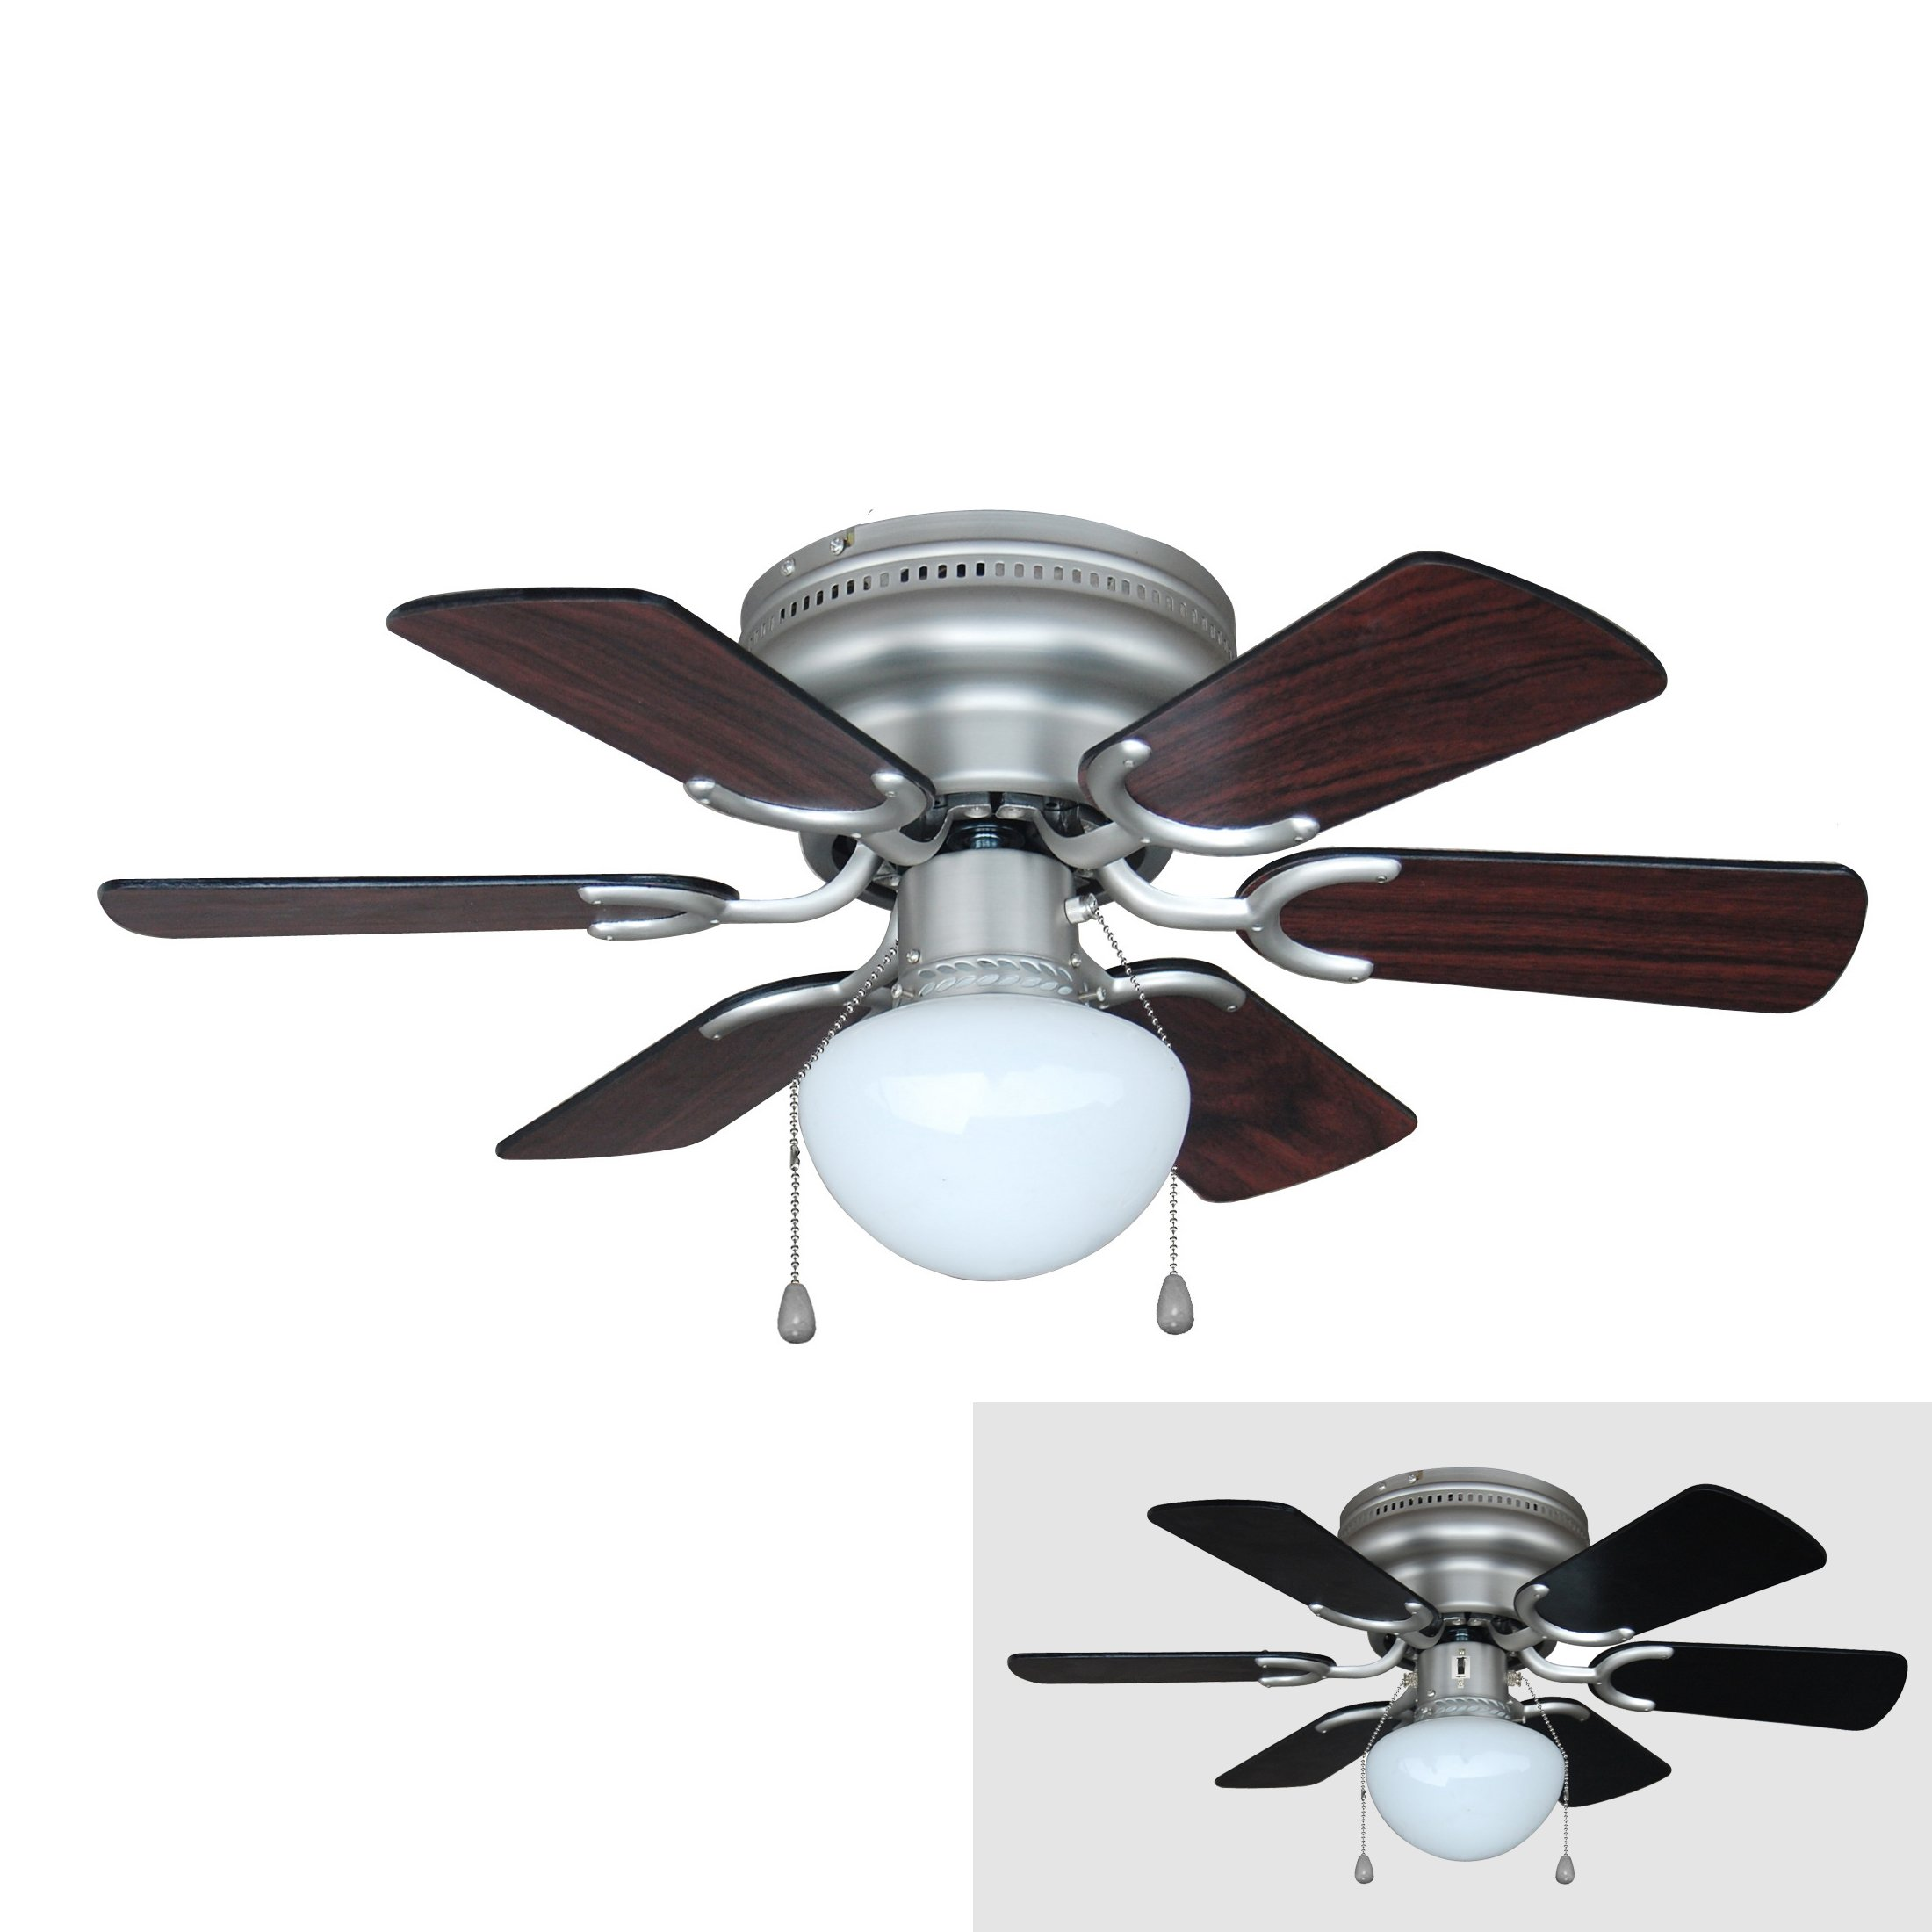 Hardware House 17-4725 Arcadia 30-Inch Satin Nickel Flush Mount Hugger Ceiling Fan, Black or Cherry Blades